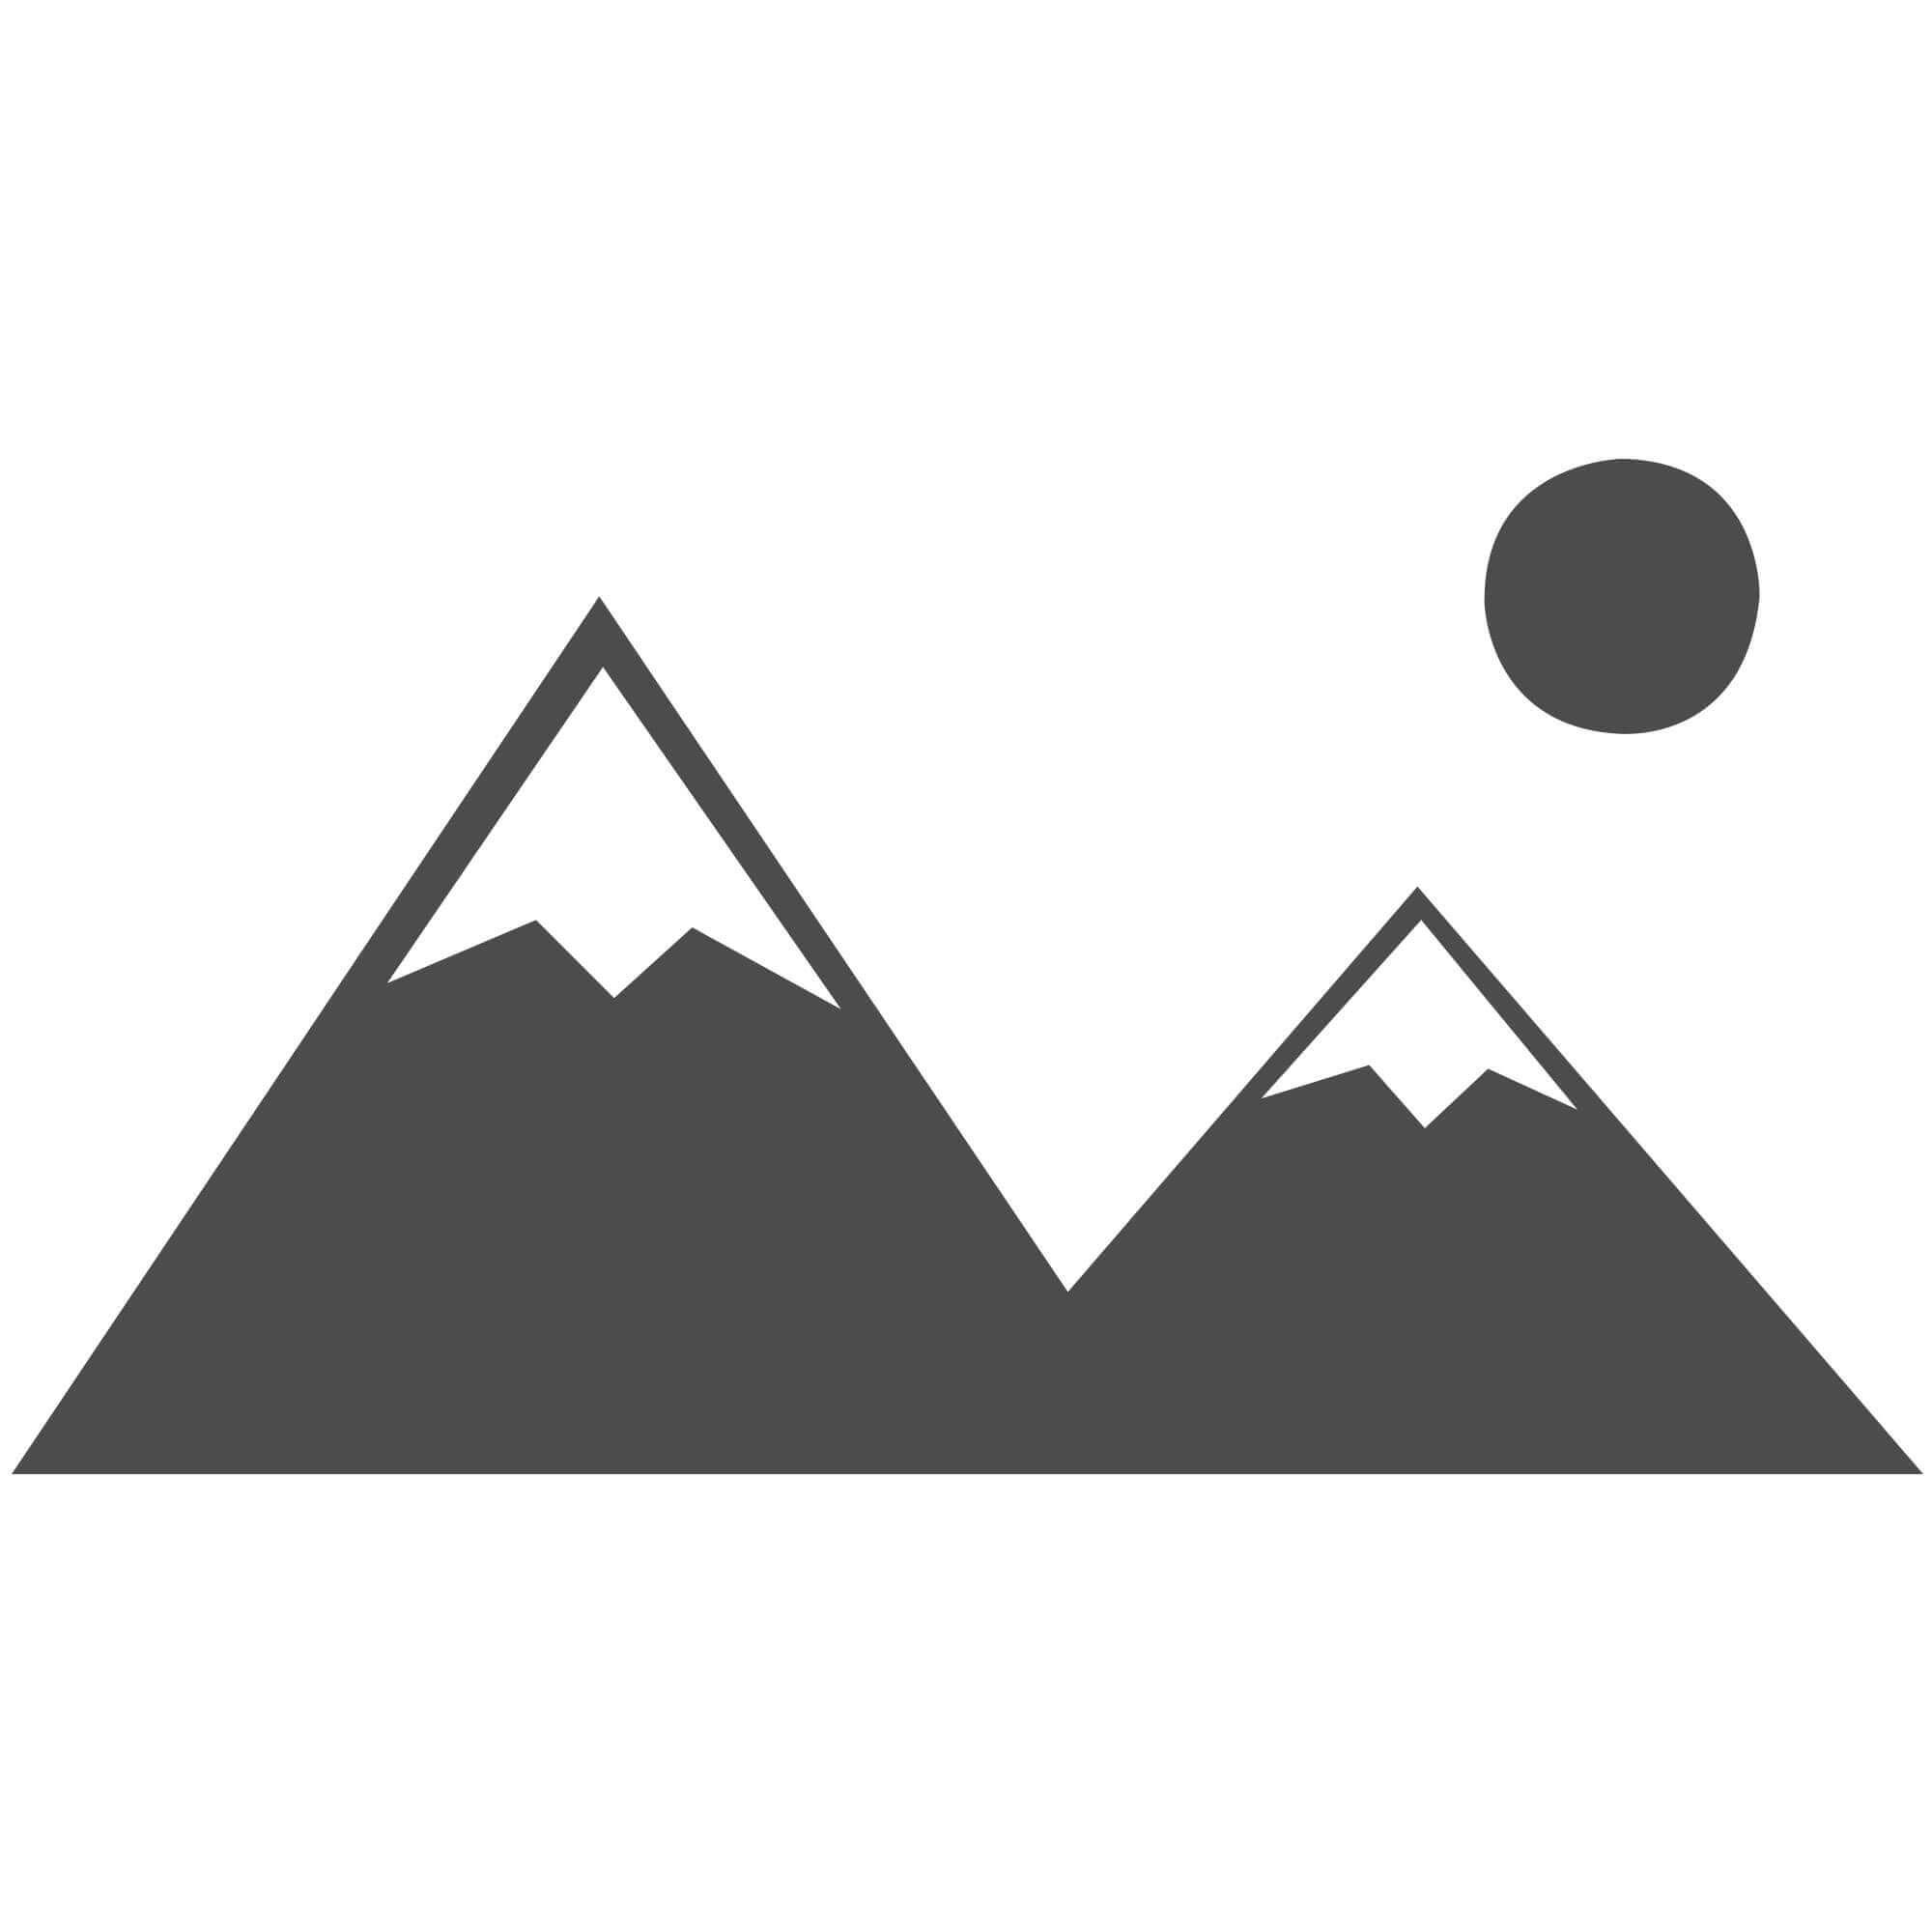 Stove Glass - Sunvision 5 multifuel stove (Square door)